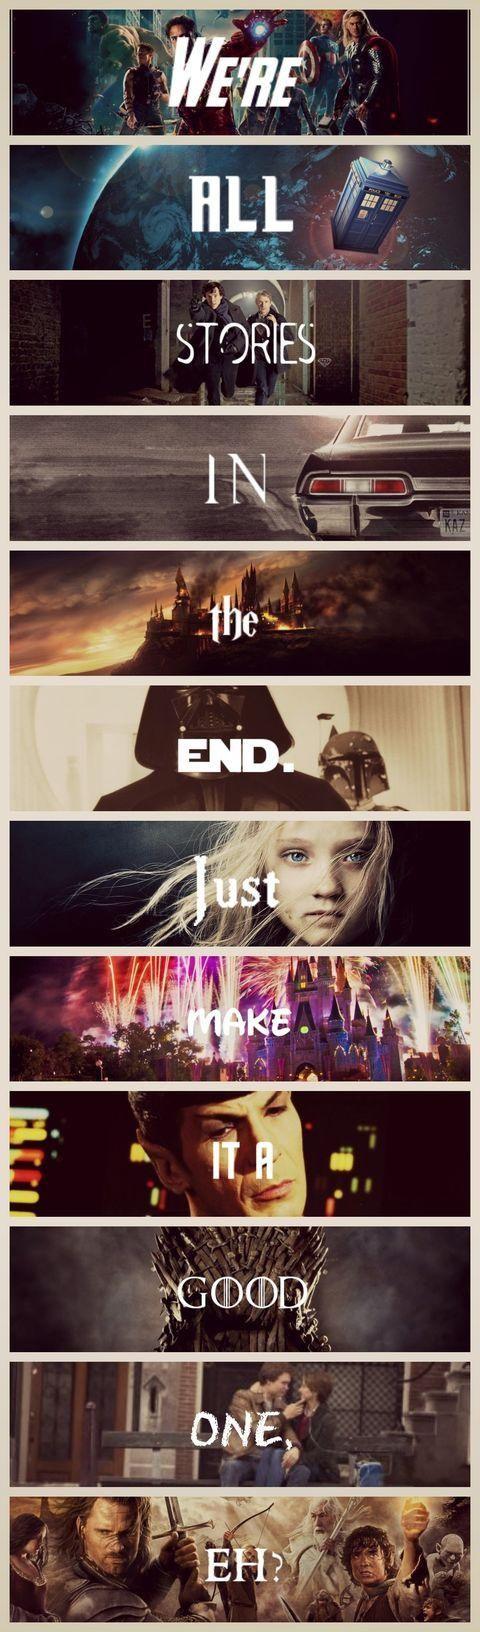 Just good stories...